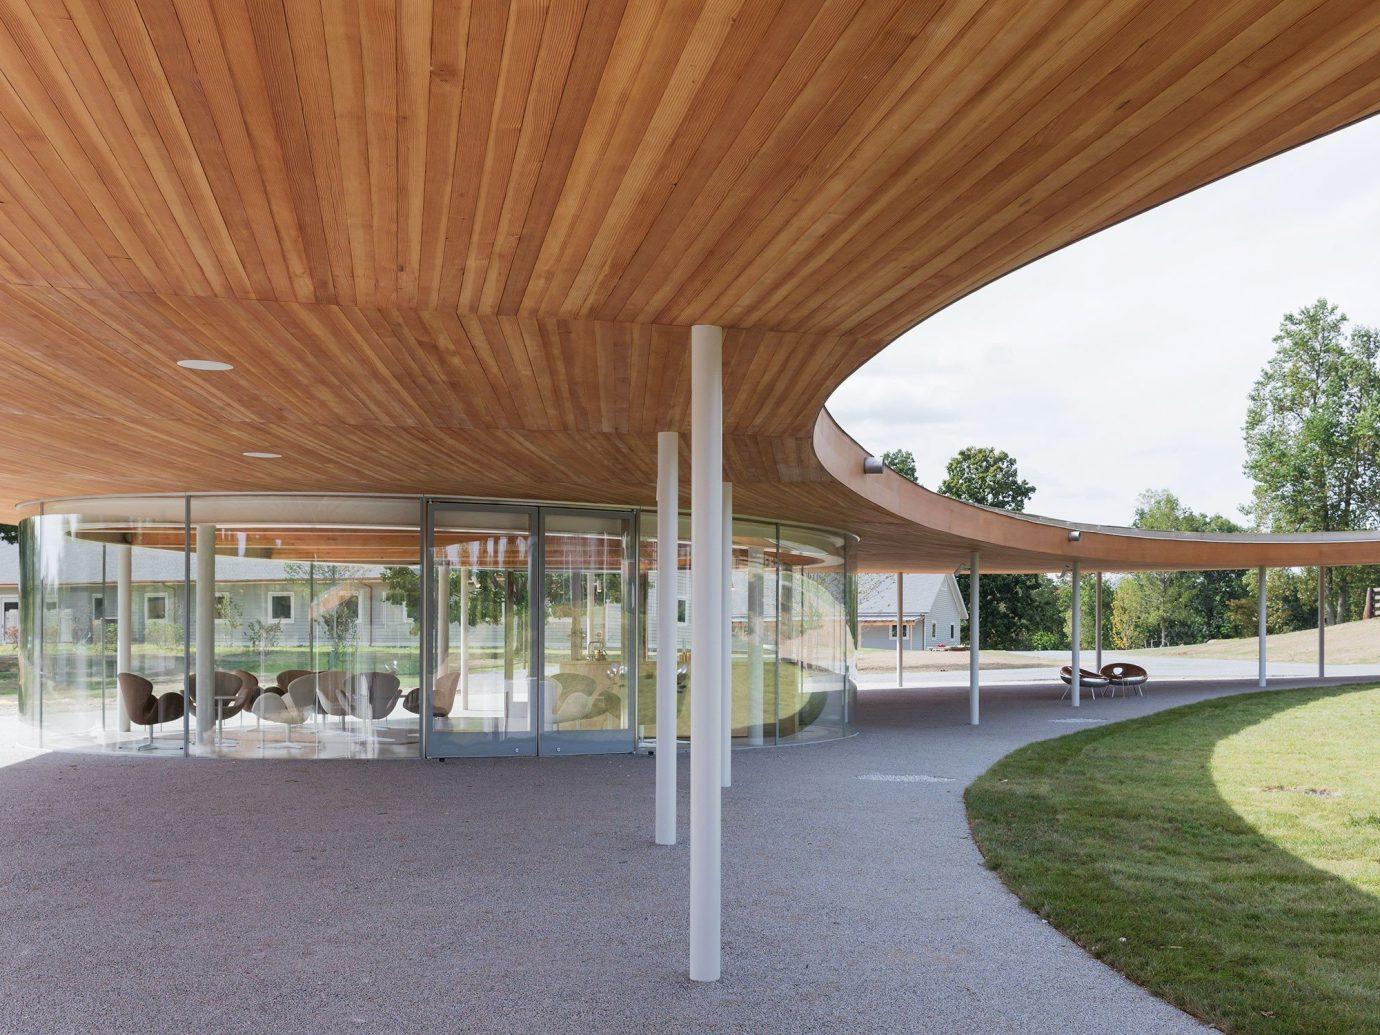 Arts + Culture grass outdoor structure property building Architecture leisure centre estate home real estate pavilion headquarters plaza